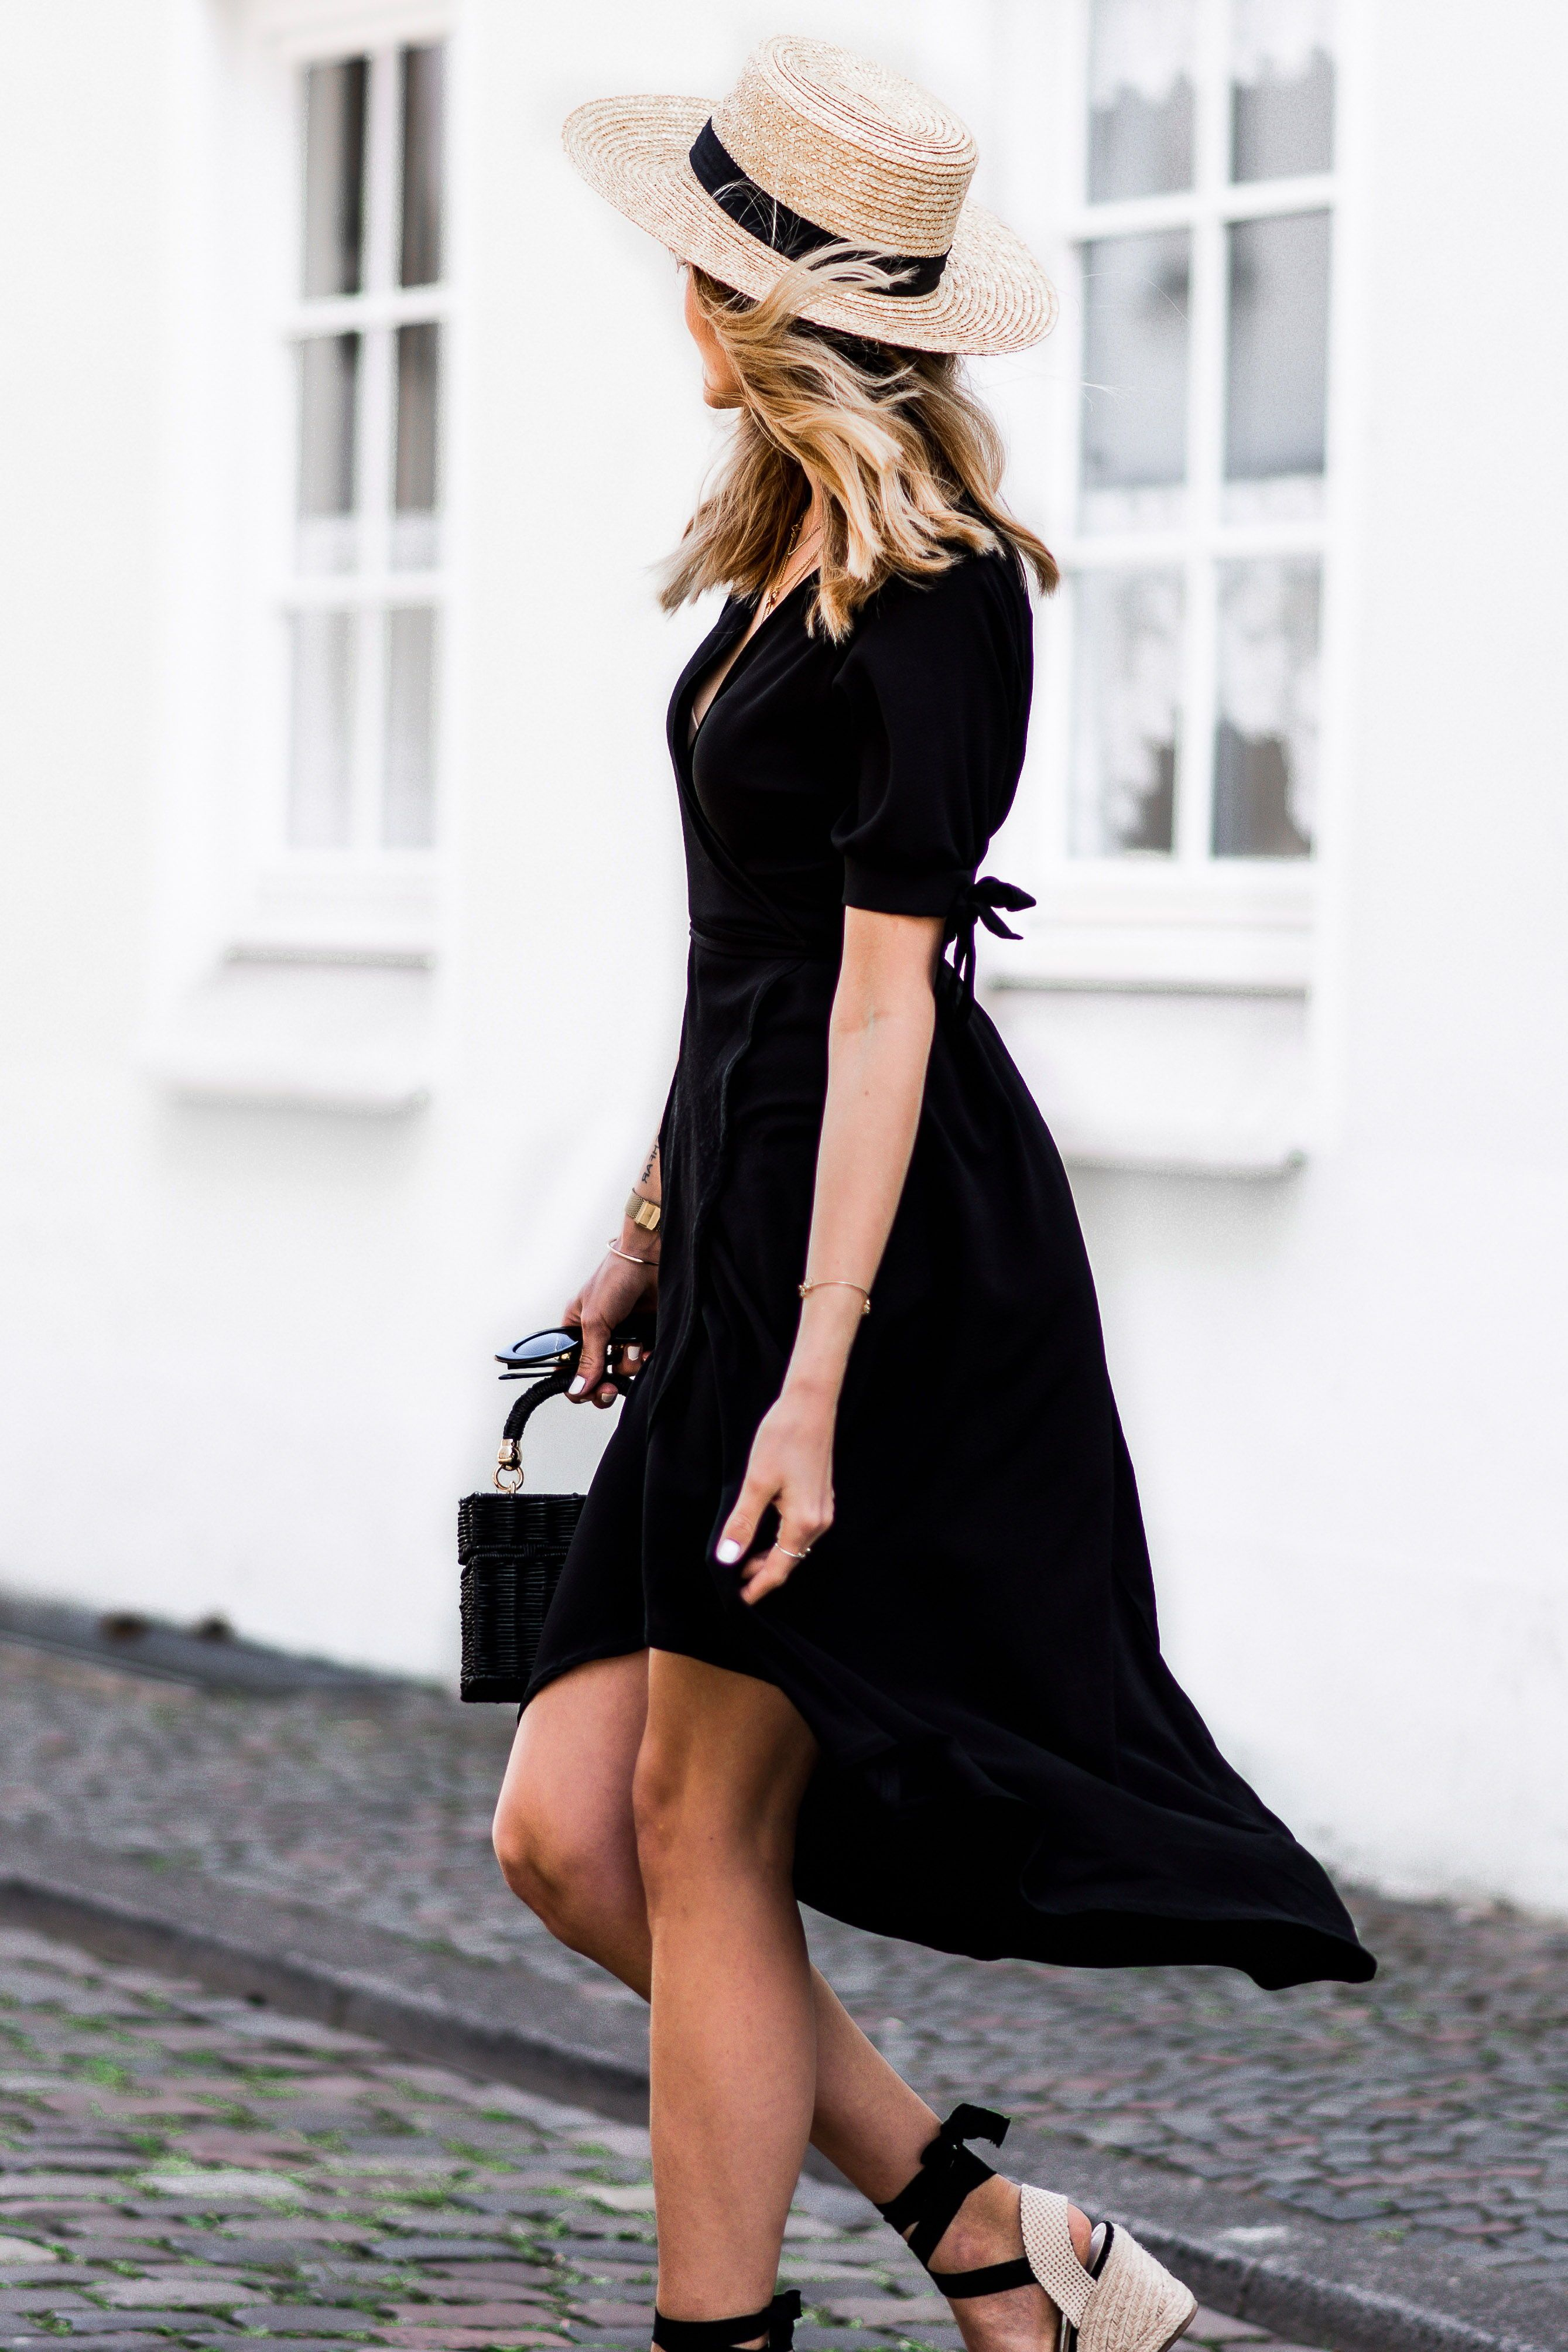 The Most Flattering Little Black Dress Lifestyle Dresses Black Dress Wedges Outfit Spring [ 4016 x 2678 Pixel ]